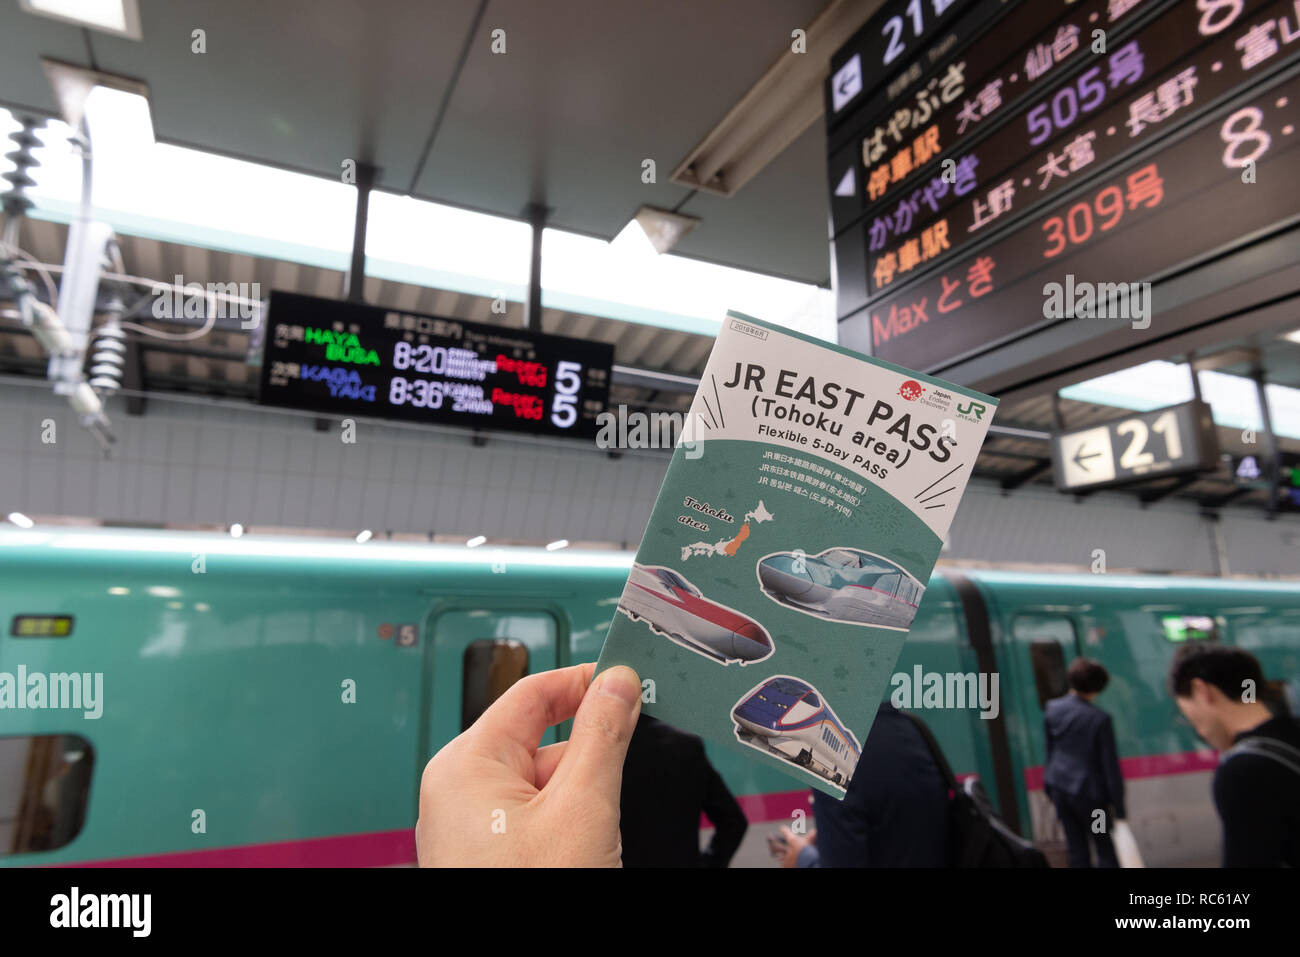 JR East PASS (Tohoku), avec le Shinkansen Hayabusa à fond. Jour 5 col flexible passe touristique région de Tohoku. Photo Stock